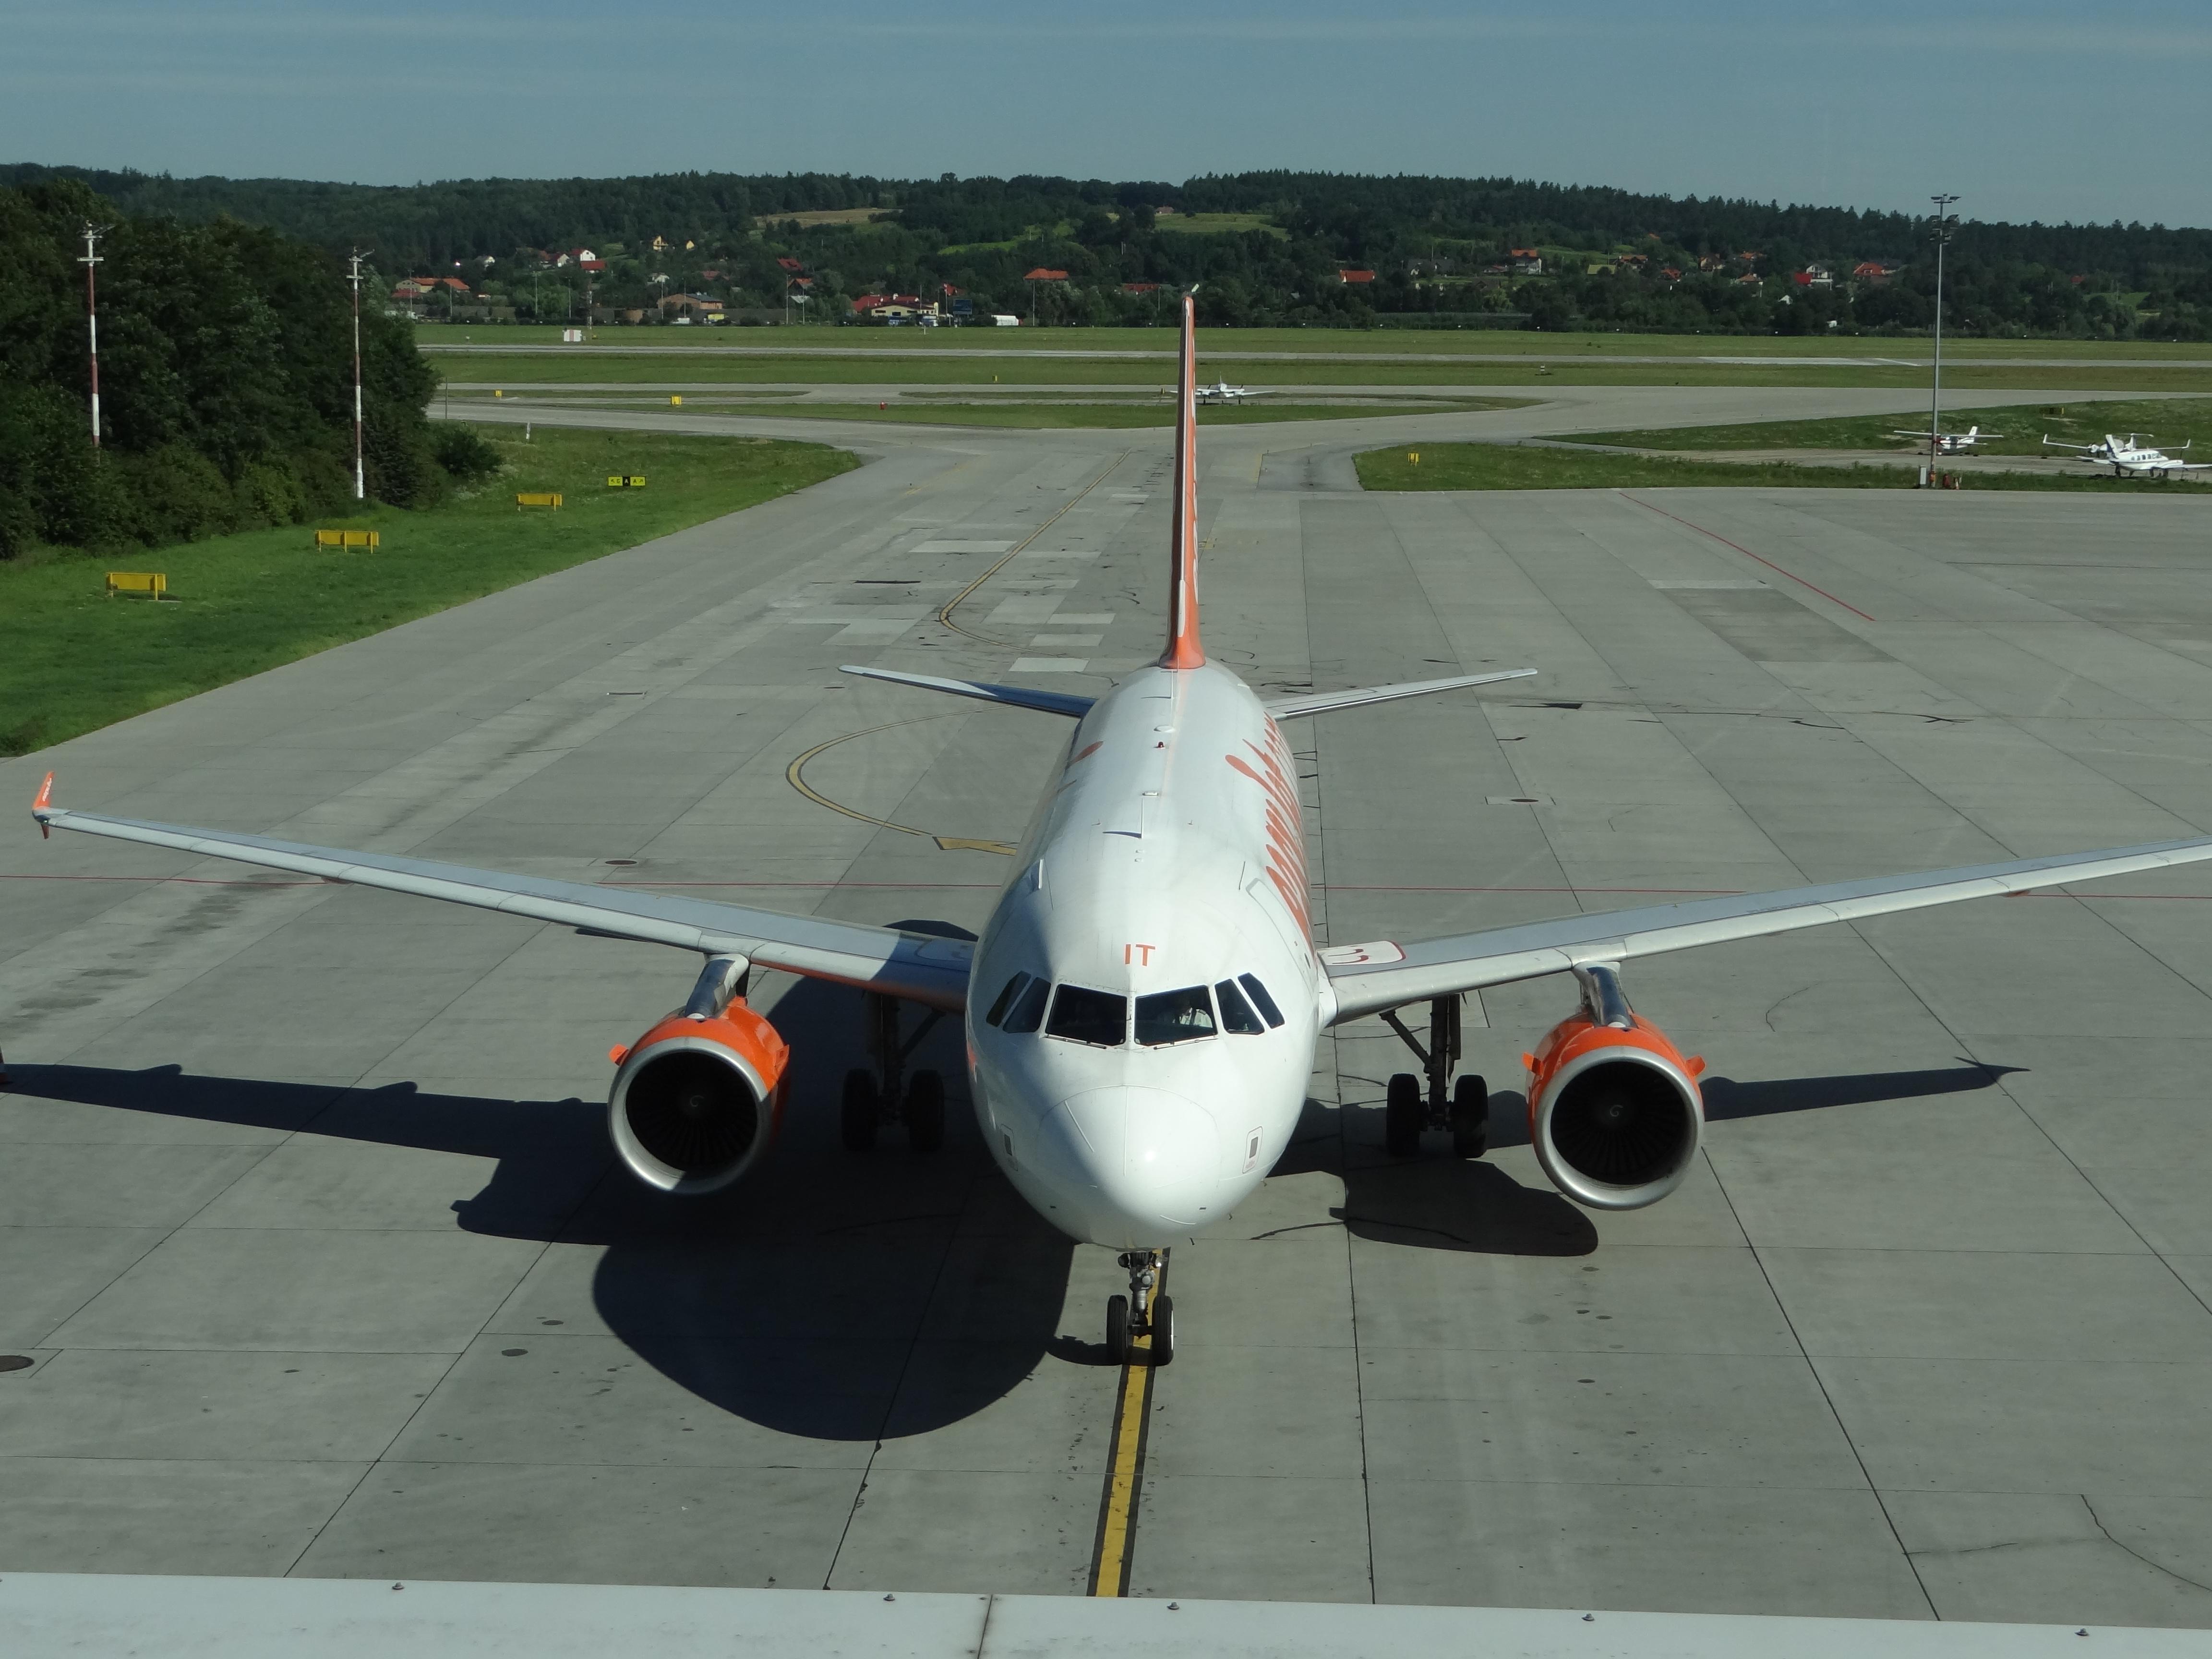 Airbus A 320 G-EZIT. 2012 year. Photo by Karol Placha Hetman